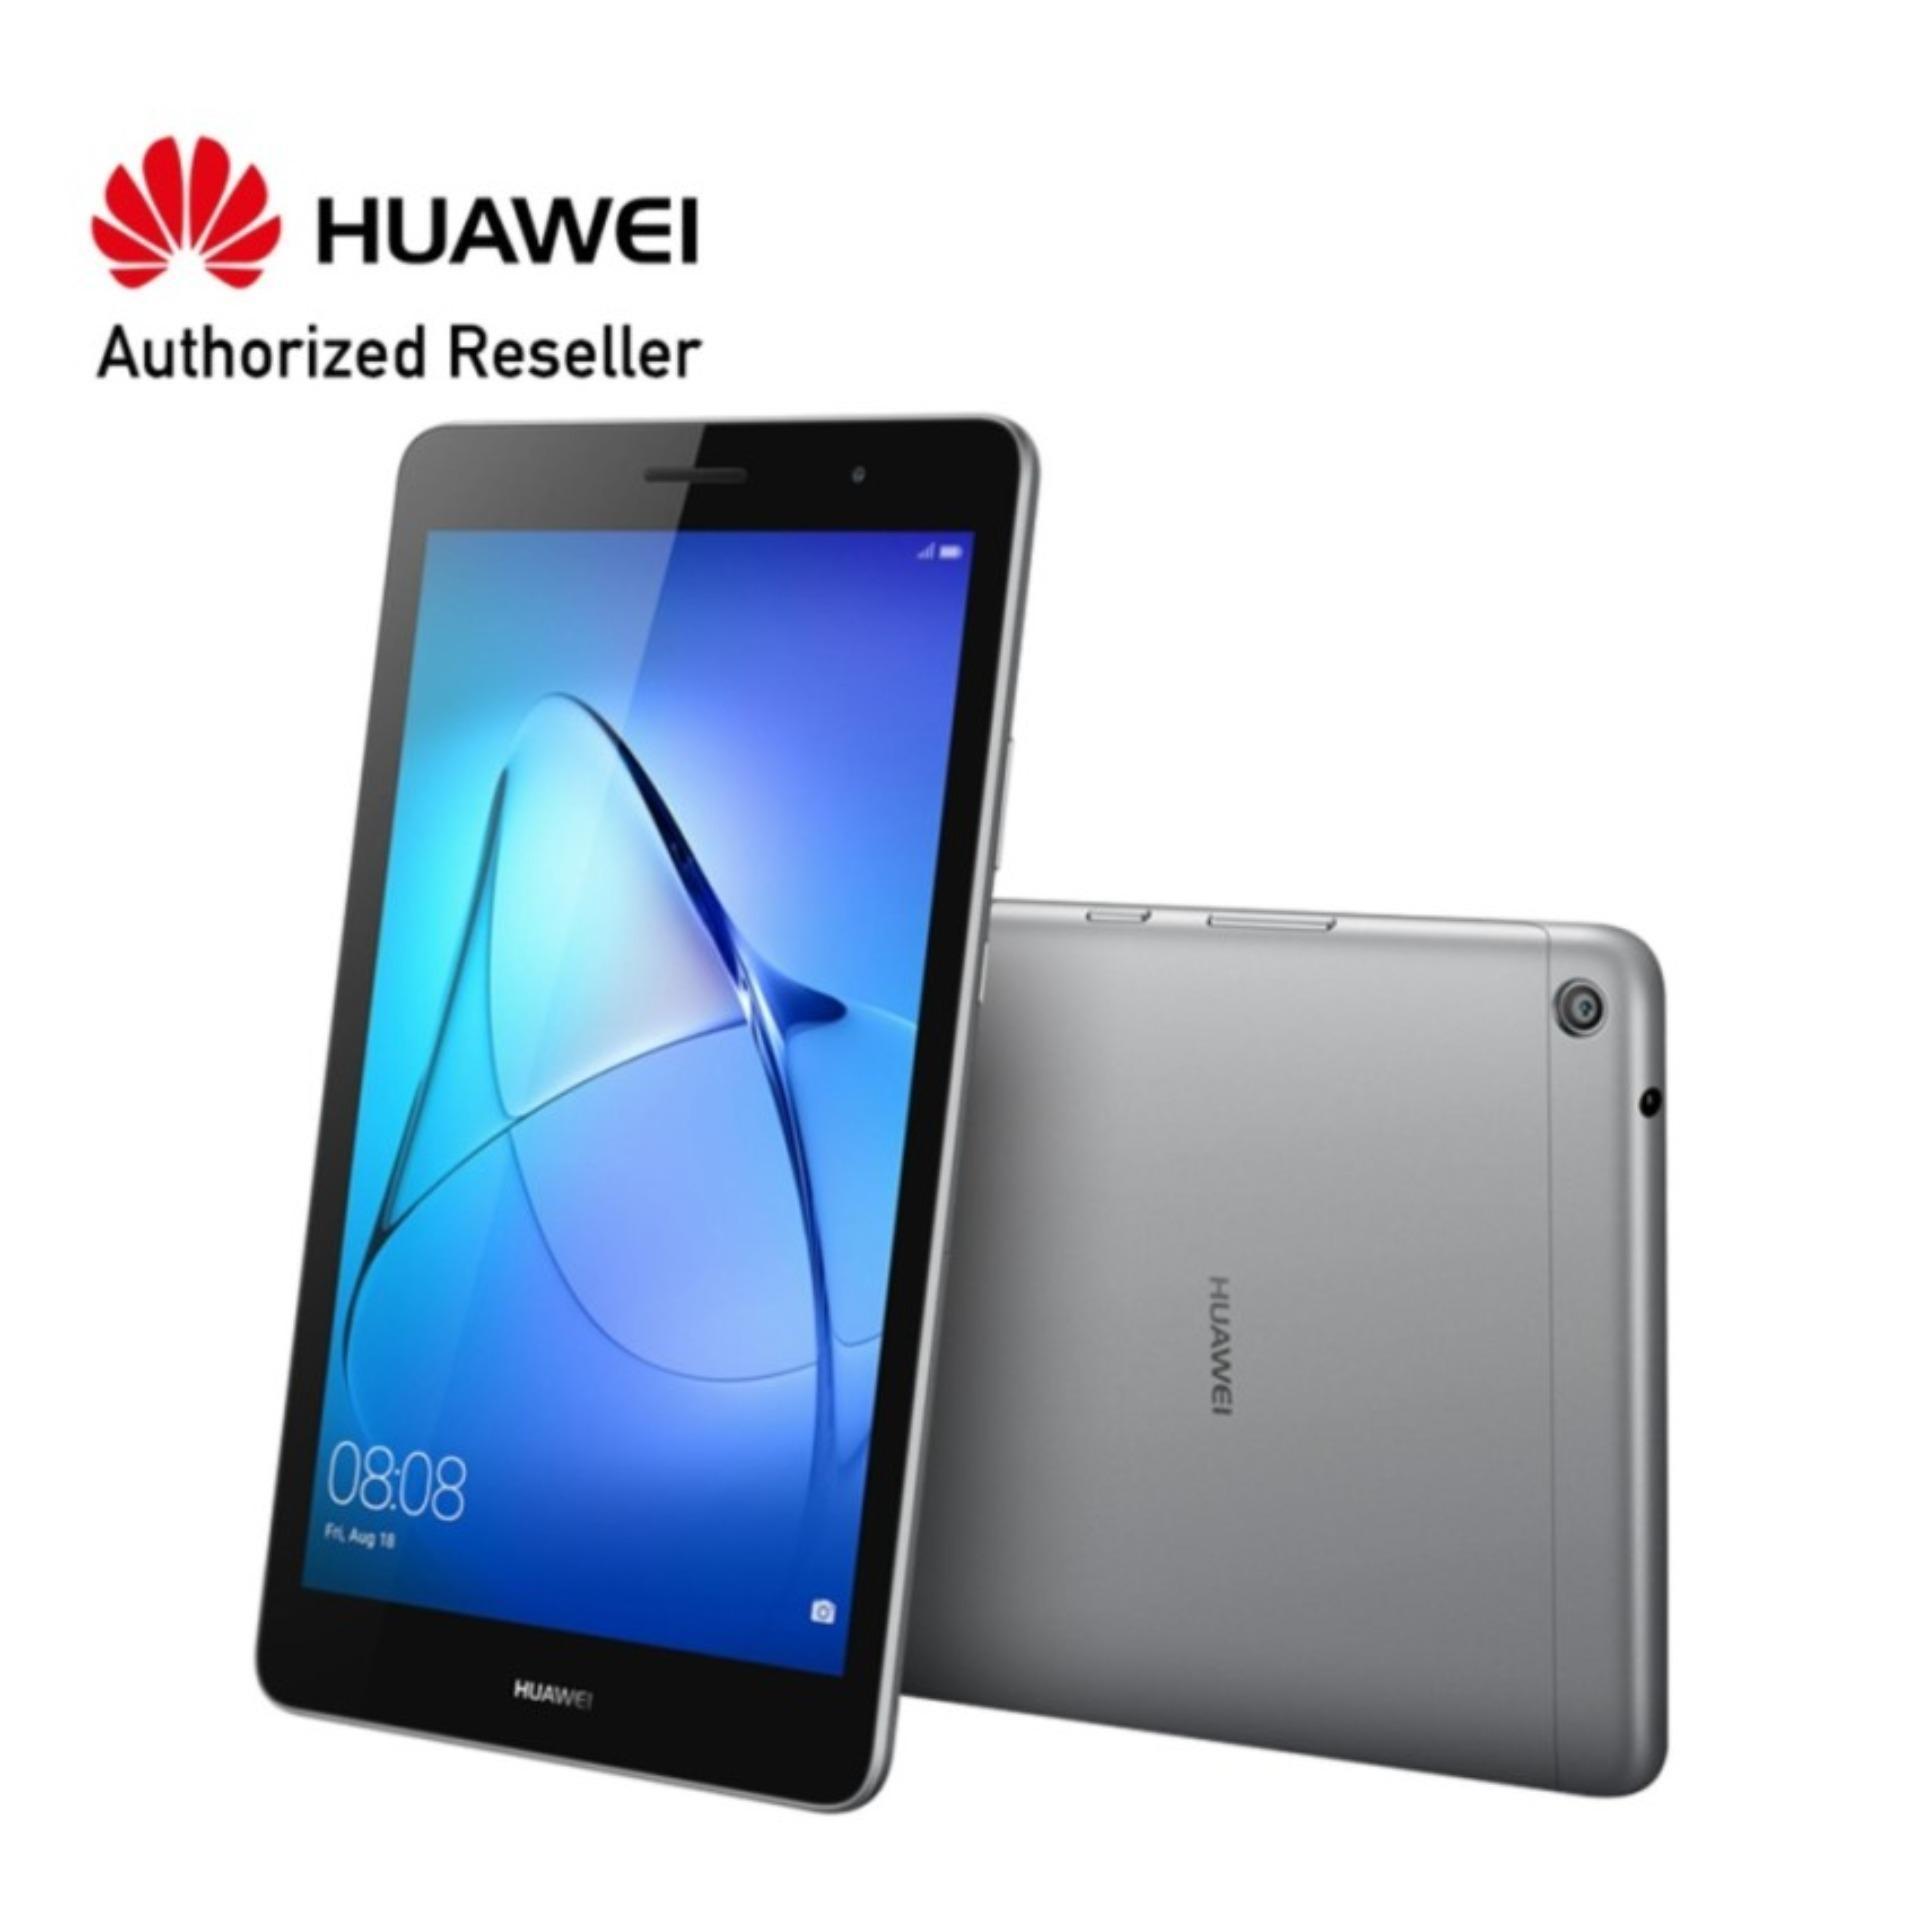 Huawei MediaPad T3 8.0 16GB LTE Tablet